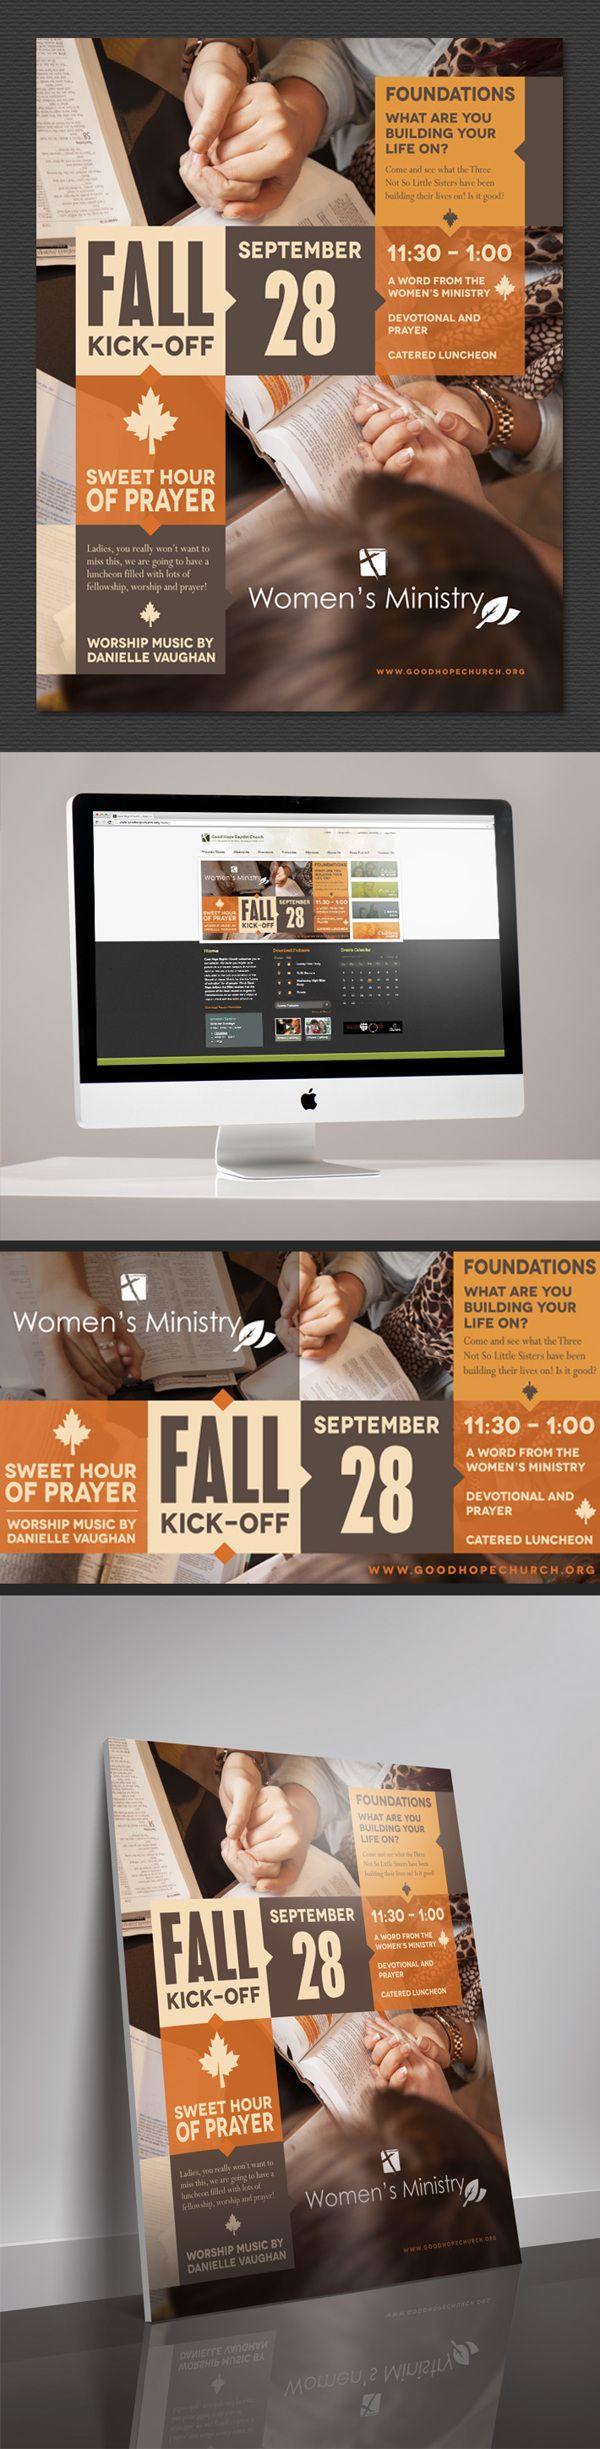 GHBC Fall Event Graphics by Carolina Reprographics , via Behance